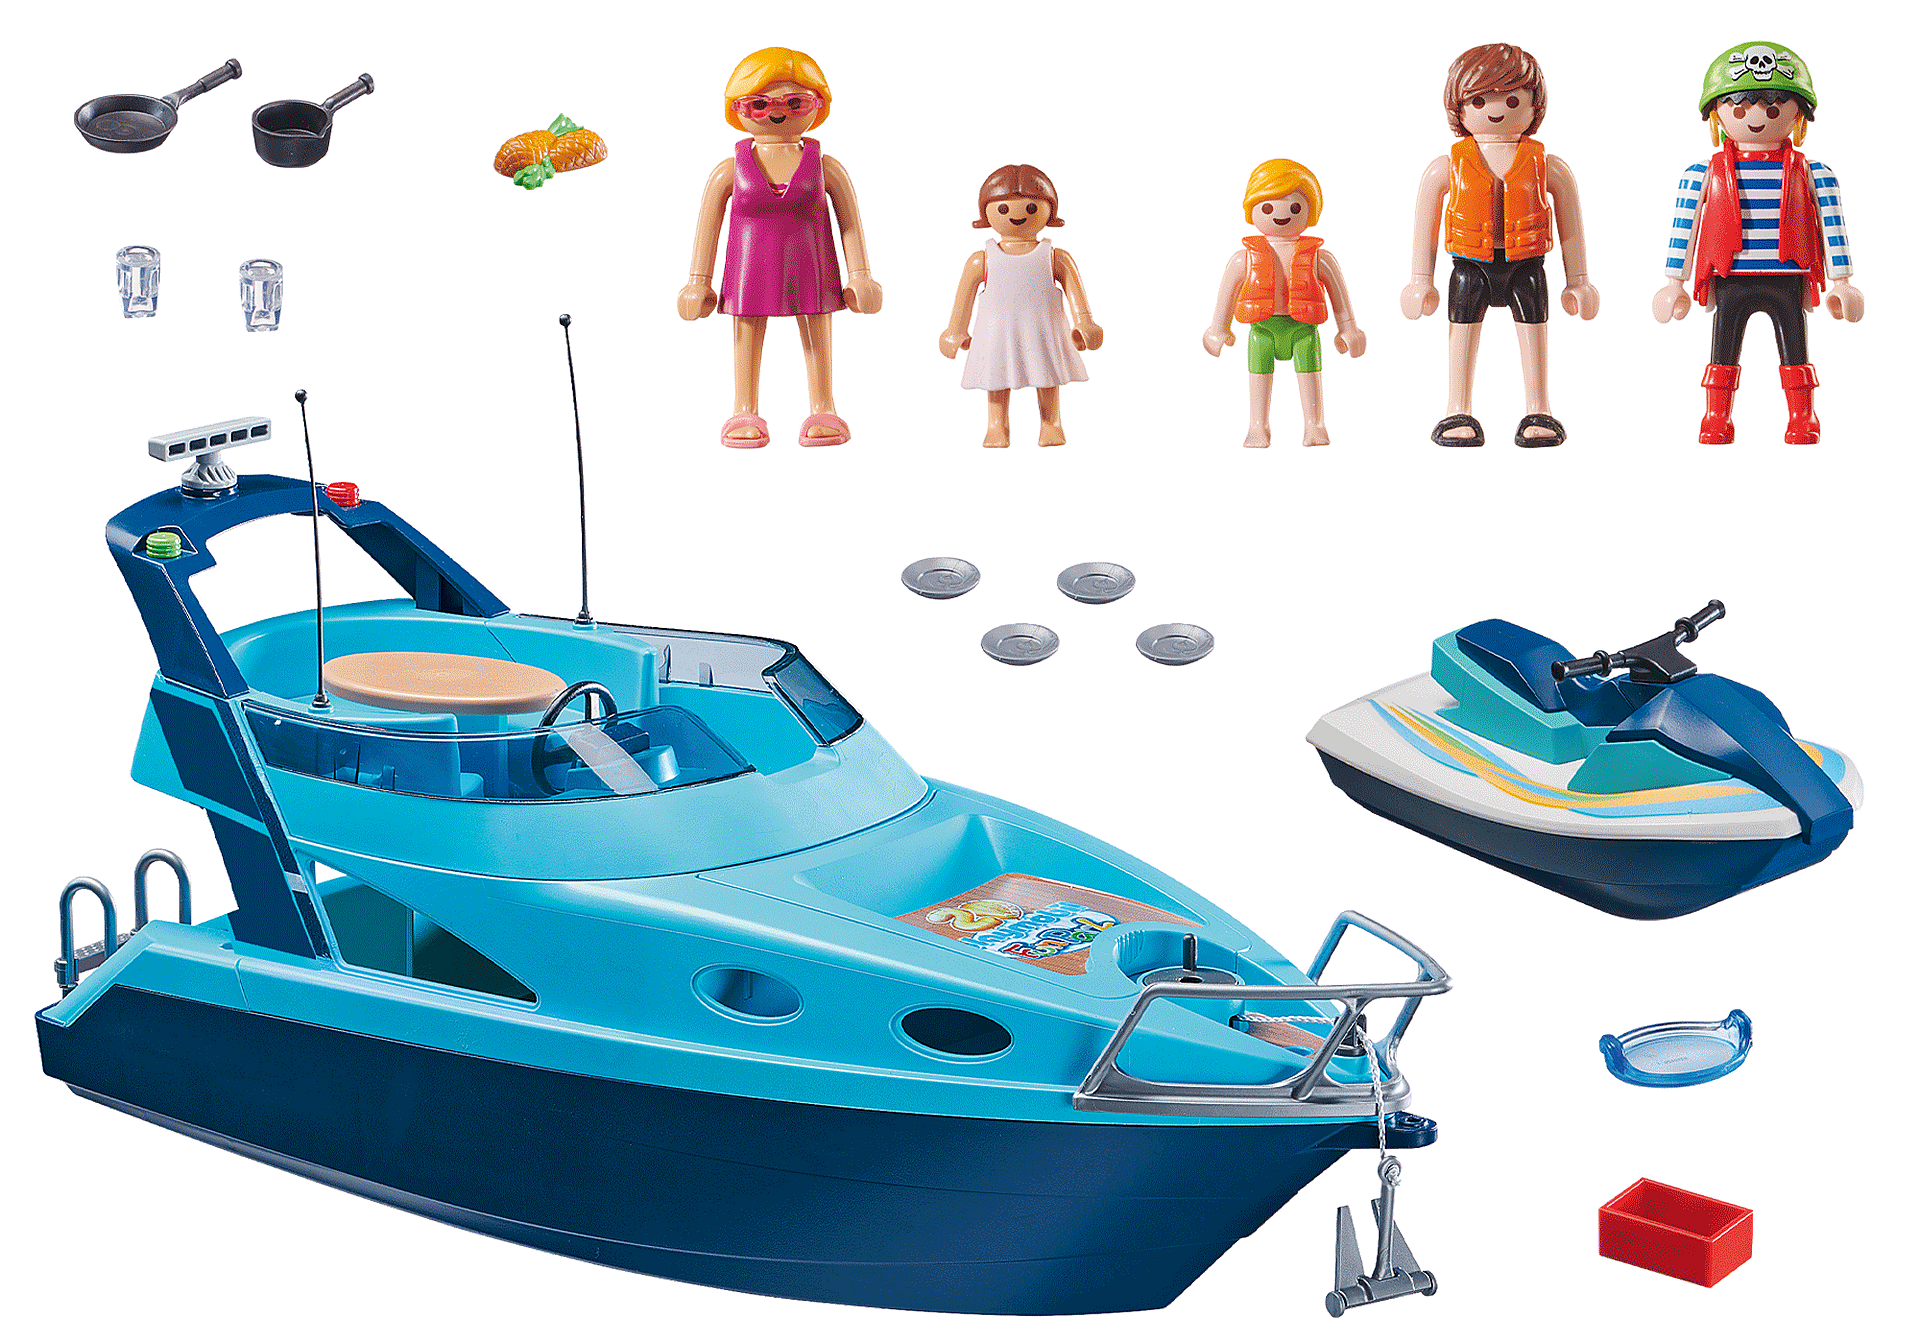 70630 PLAYMOBIL-FunPark Yacht zoom image3